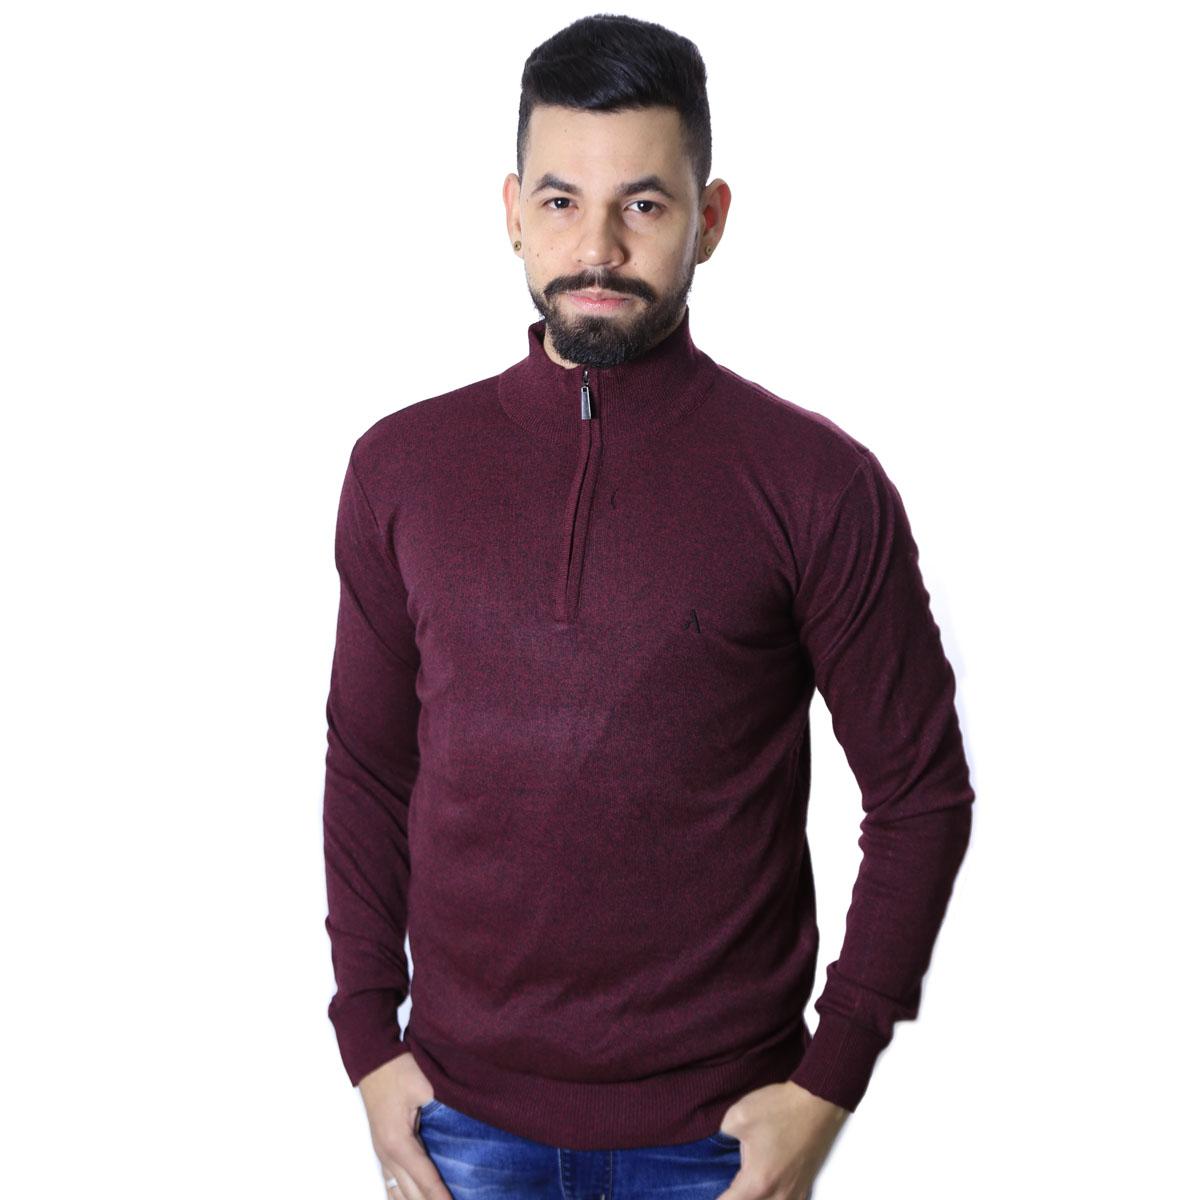 Suéter Agricio Meio Ziper Basico Vinho Mescla